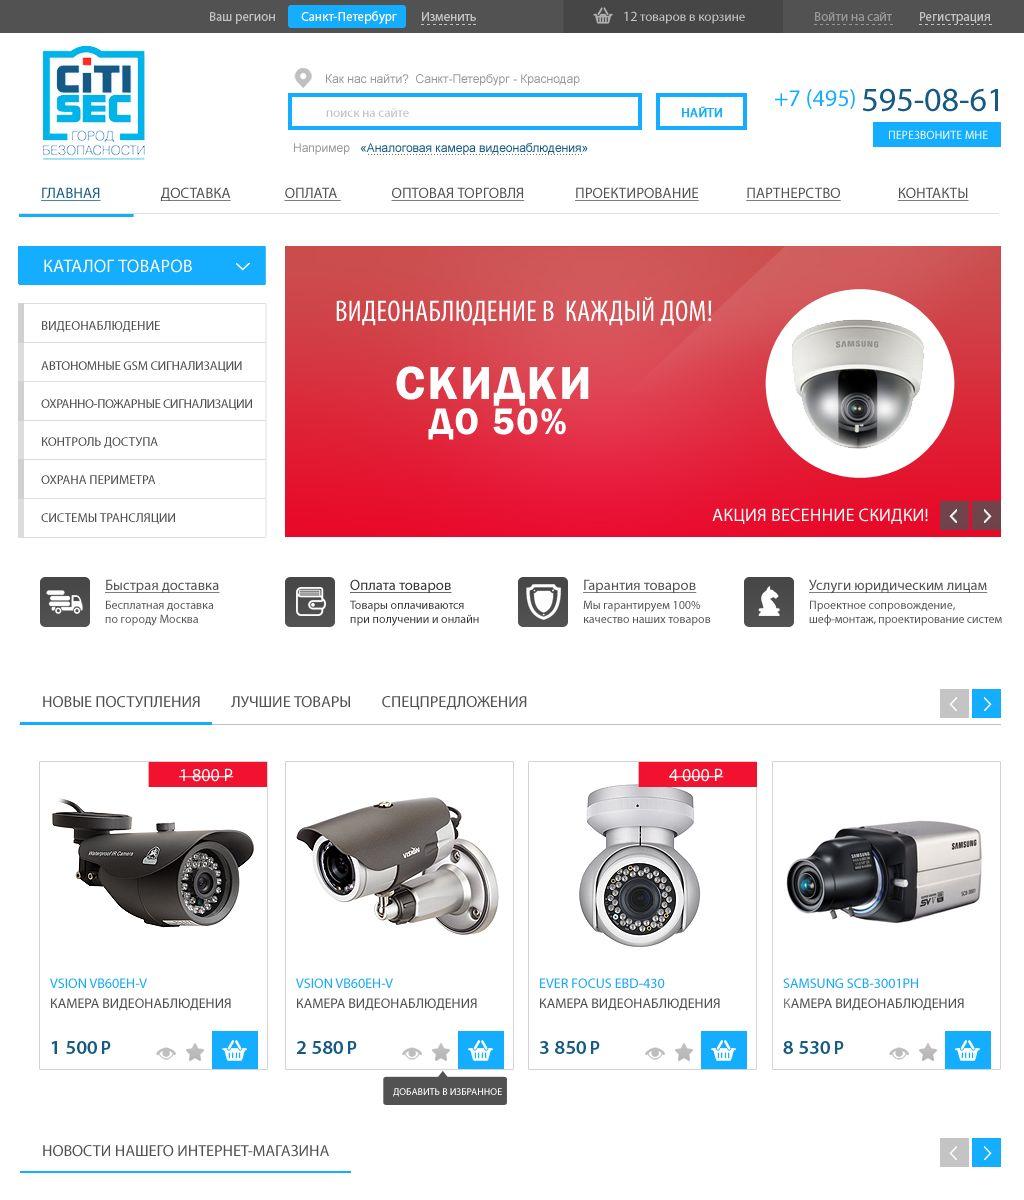 Дизайн интернет-магазина\сайта citi-sec.ru - дизайнер Lelik_V